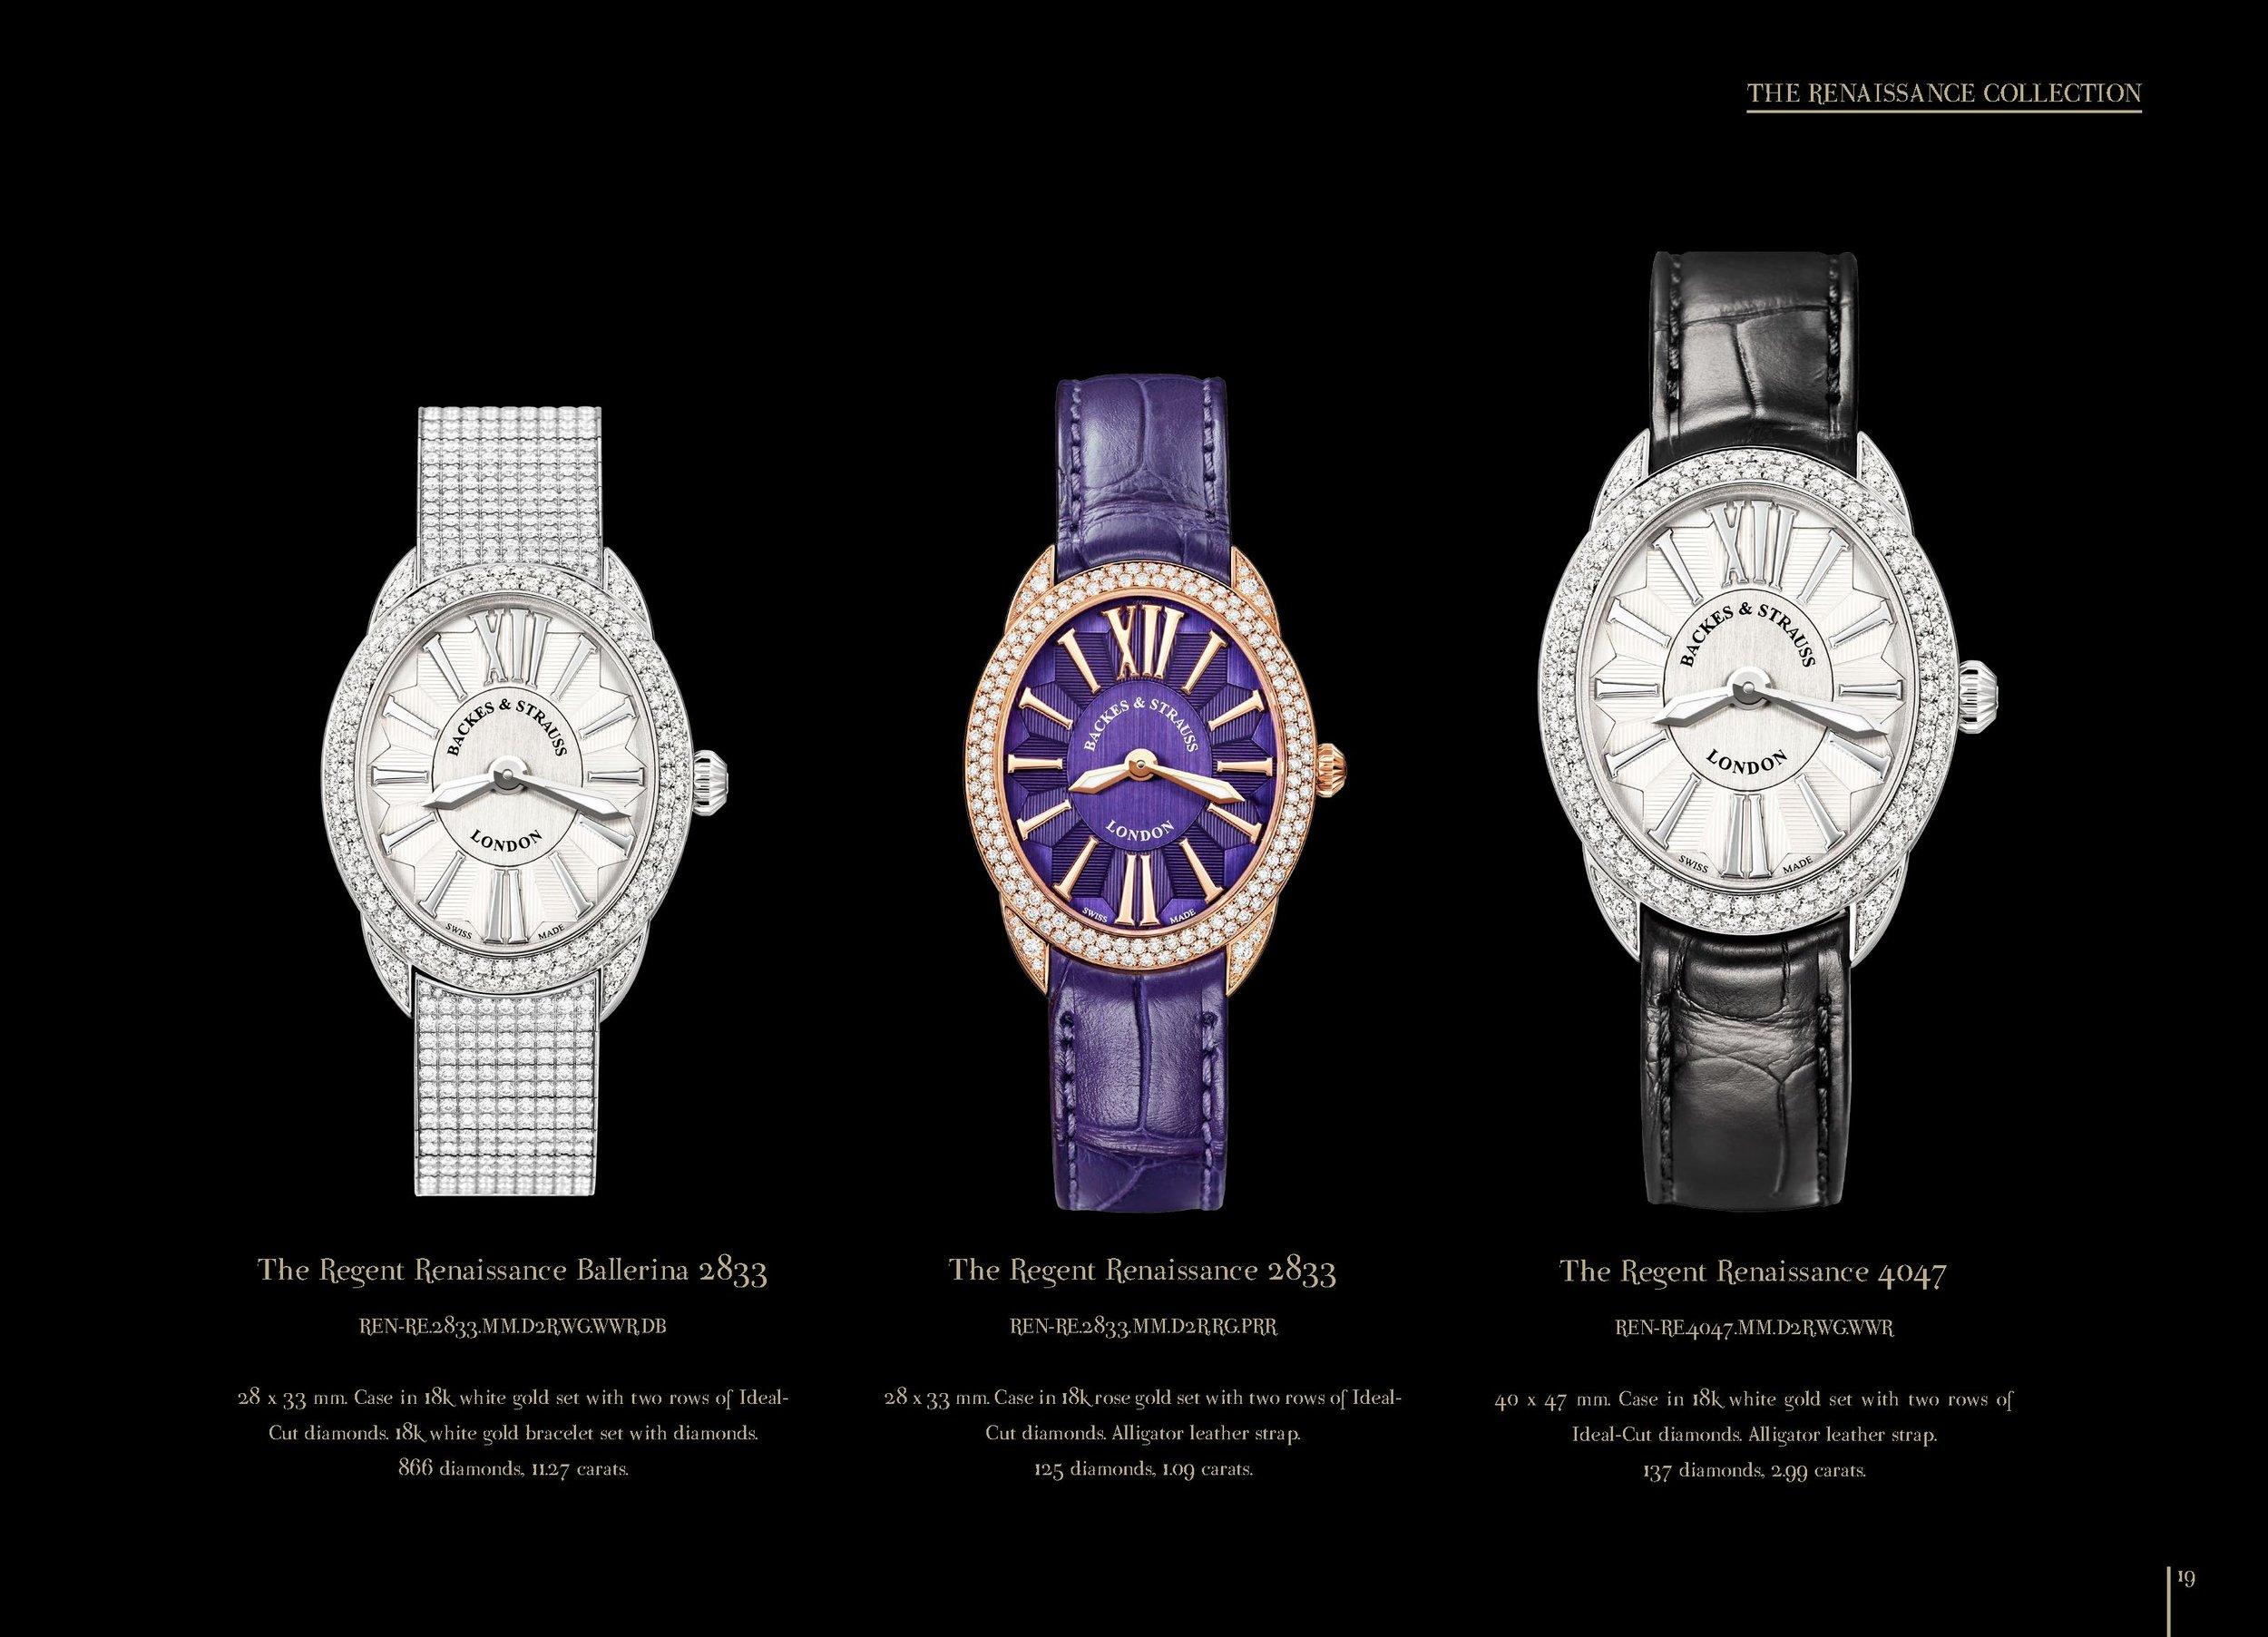 Regent Renaissance collection watch